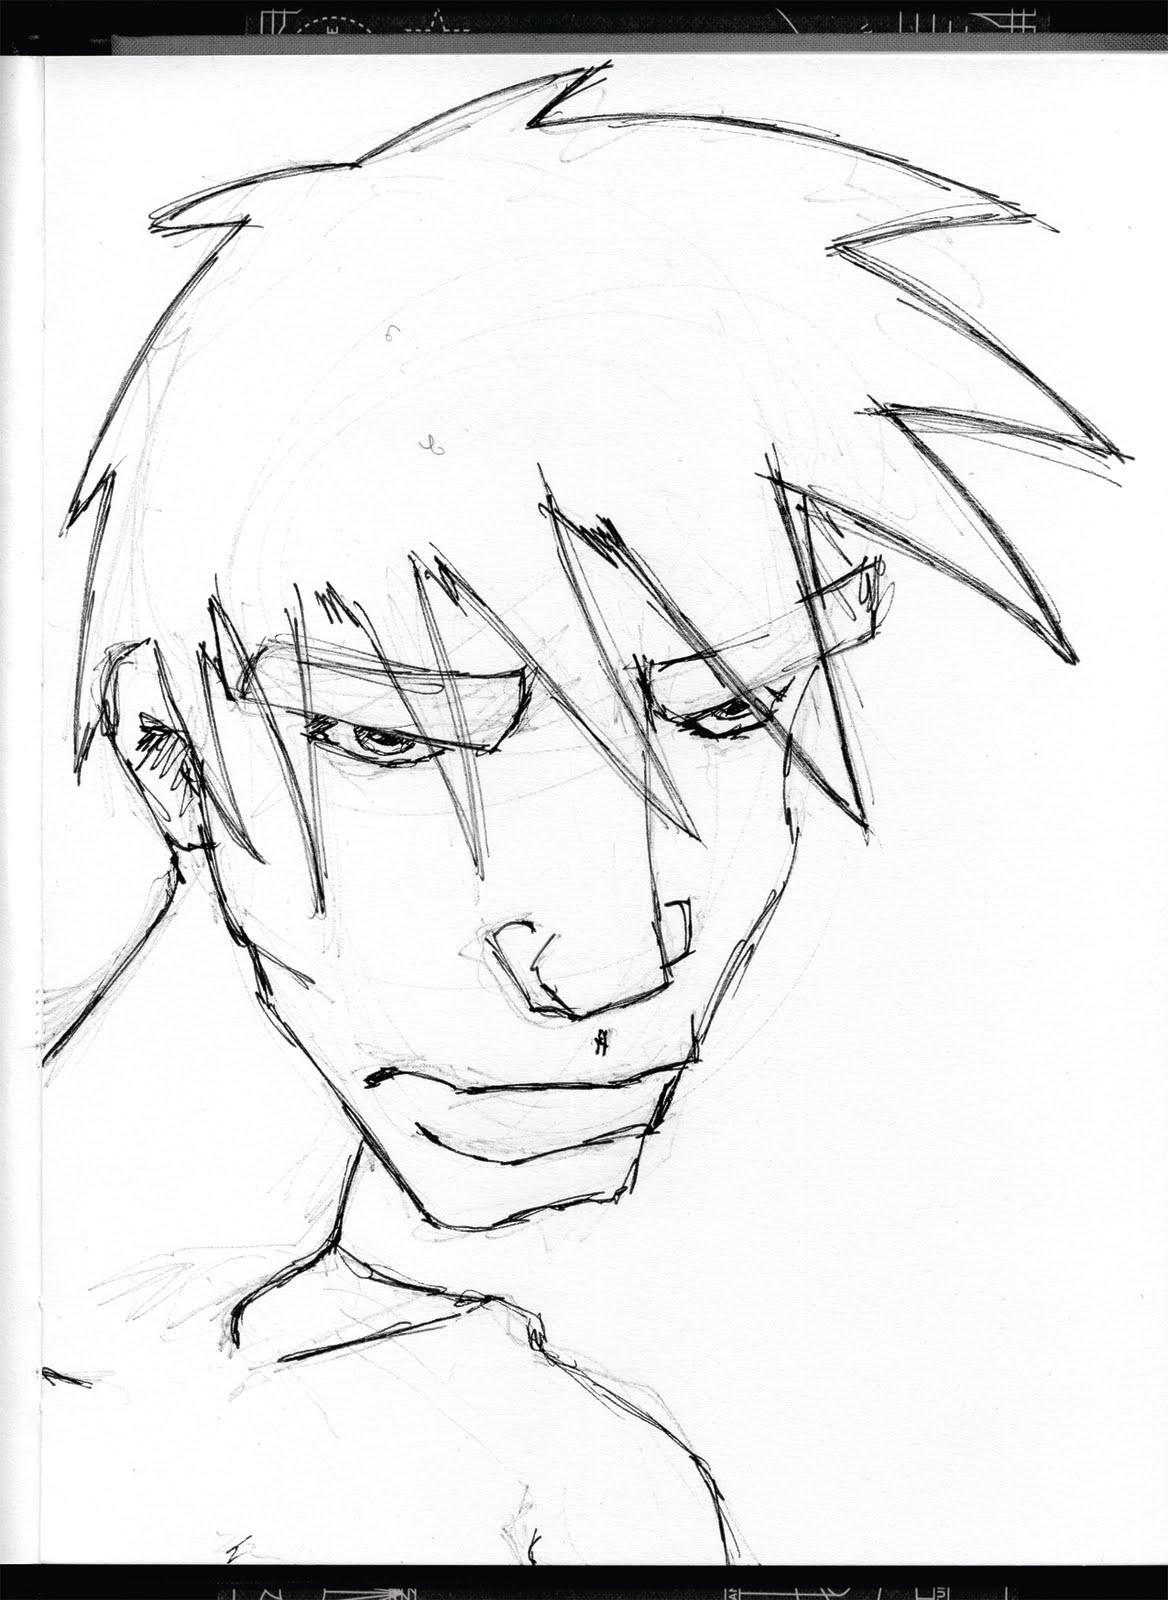 http://4.bp.blogspot.com/_lbw5UrCyc8s/TSvekNUe9lI/AAAAAAAAACo/fMZ1SFBC2tA/s1600/01.09.11_Guy_Sketch.jpg